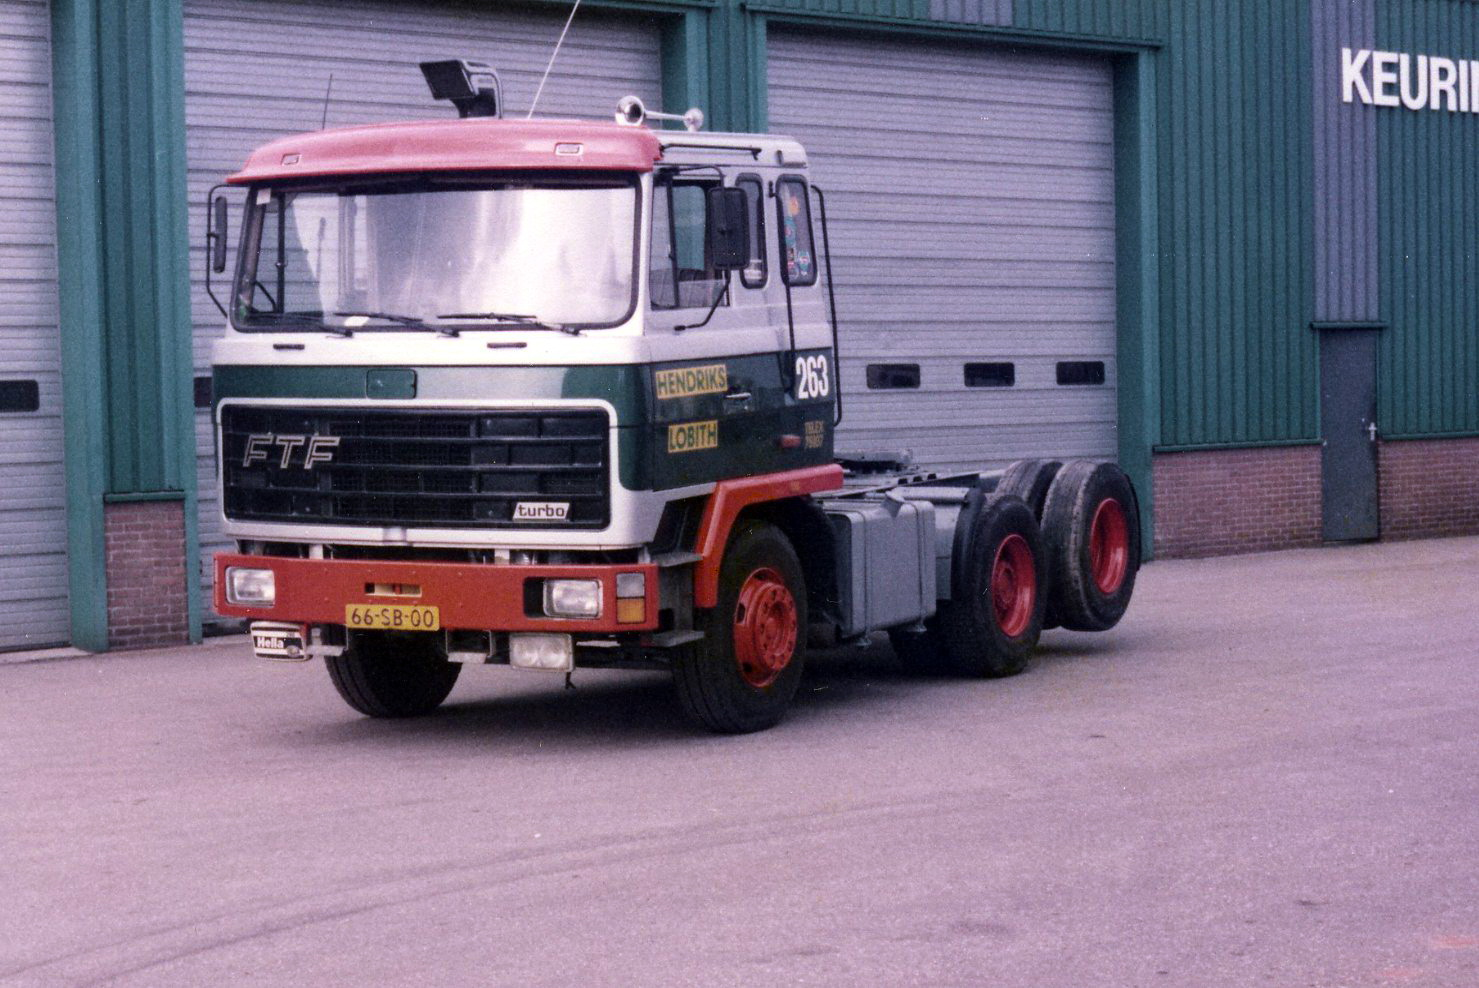 Hendriks-Lobith-FTF-FS-7.20S-66SB00-ex-Berns-Haalderen-2